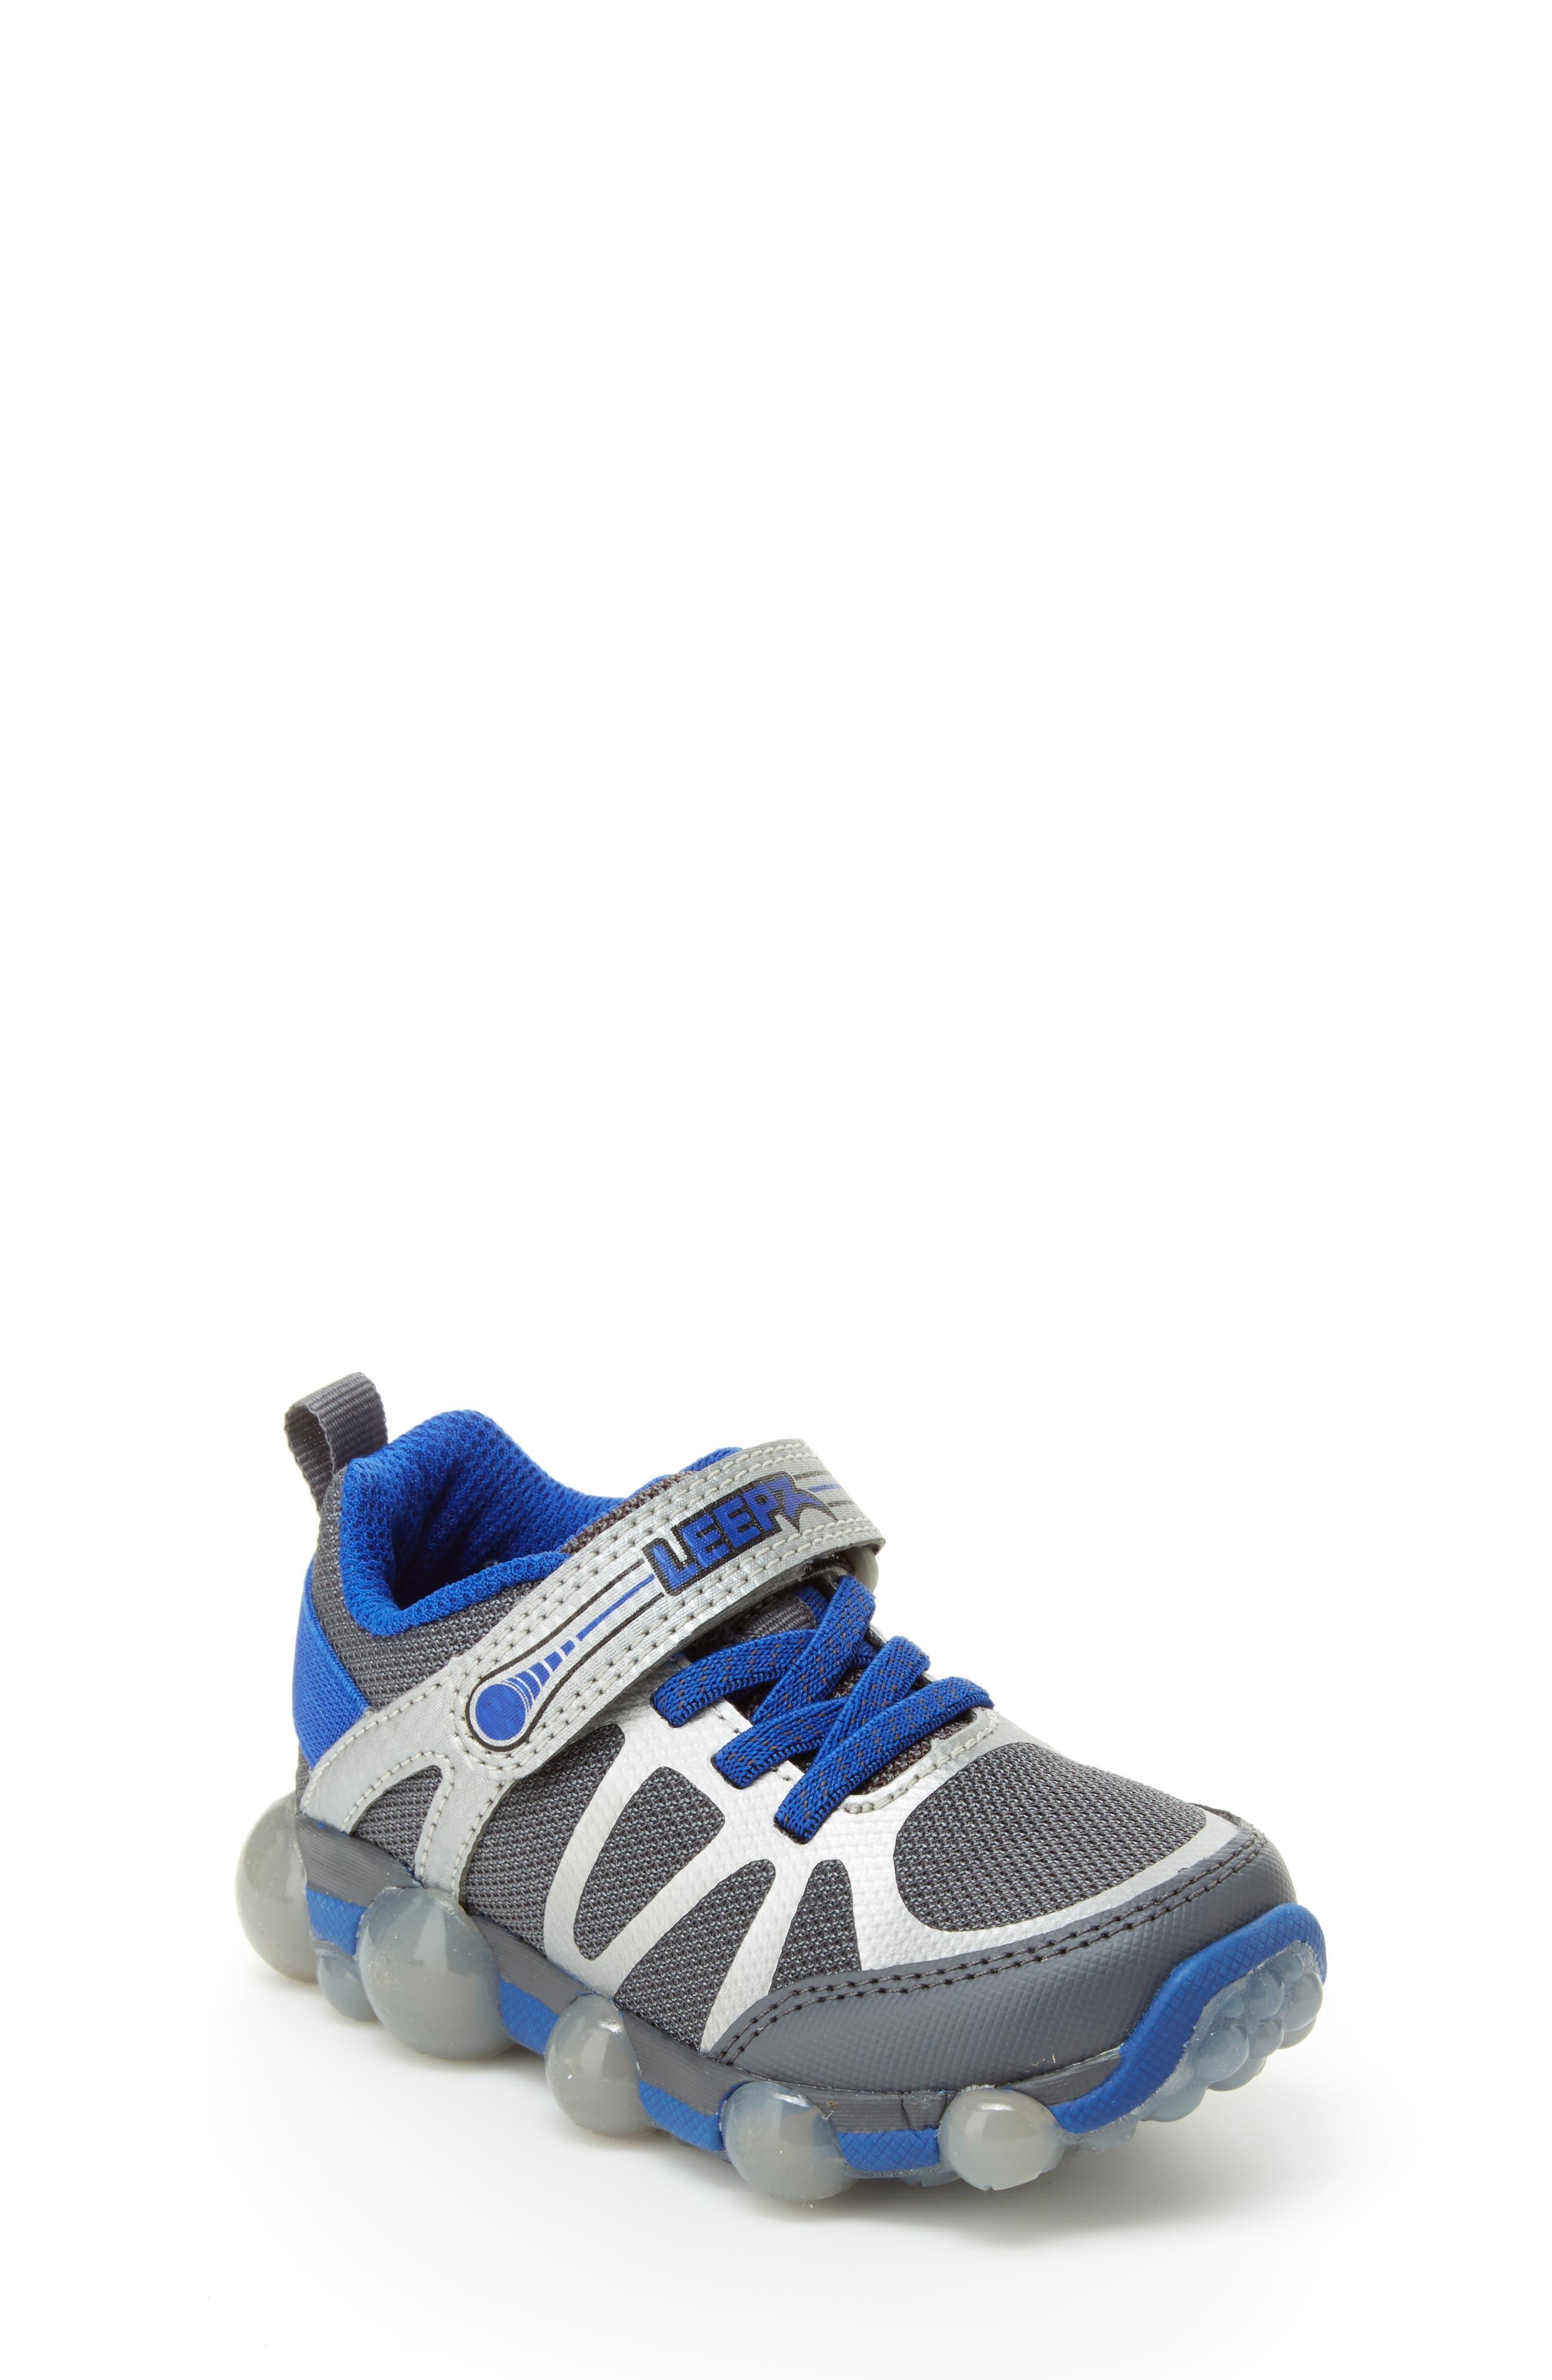 Leepz 3.0 Light-Up Sneaker,                         Main,                         color, DARK GREY/ BLUE